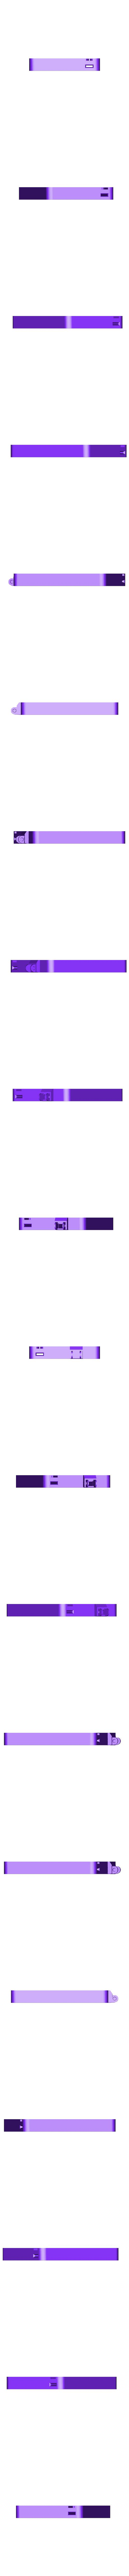 Slider_Base_V3.STL Télécharger fichier STL gratuit Barman robotique • Plan à imprimer en 3D, DIYMachines